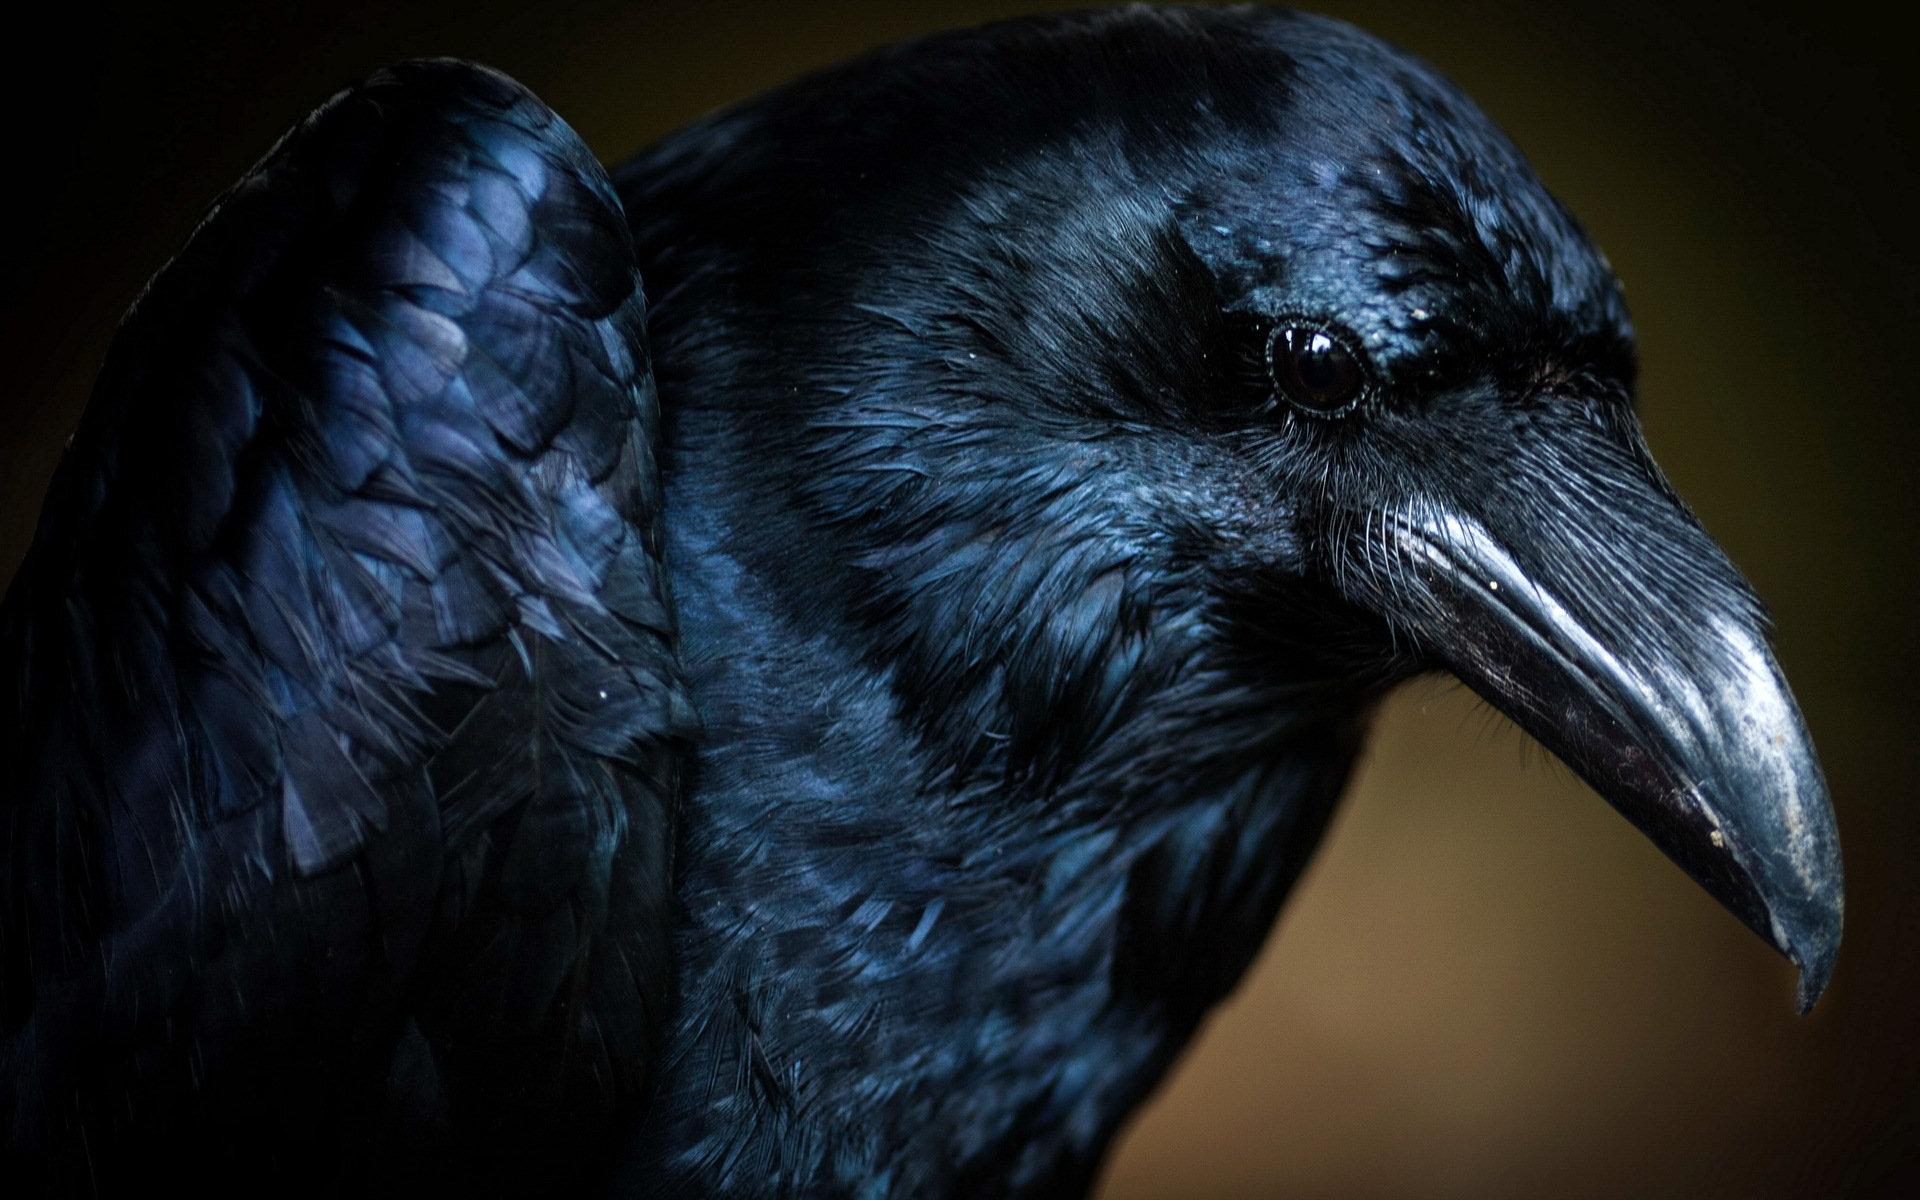 ... Crow Wallpaper; Crow Wallpaper